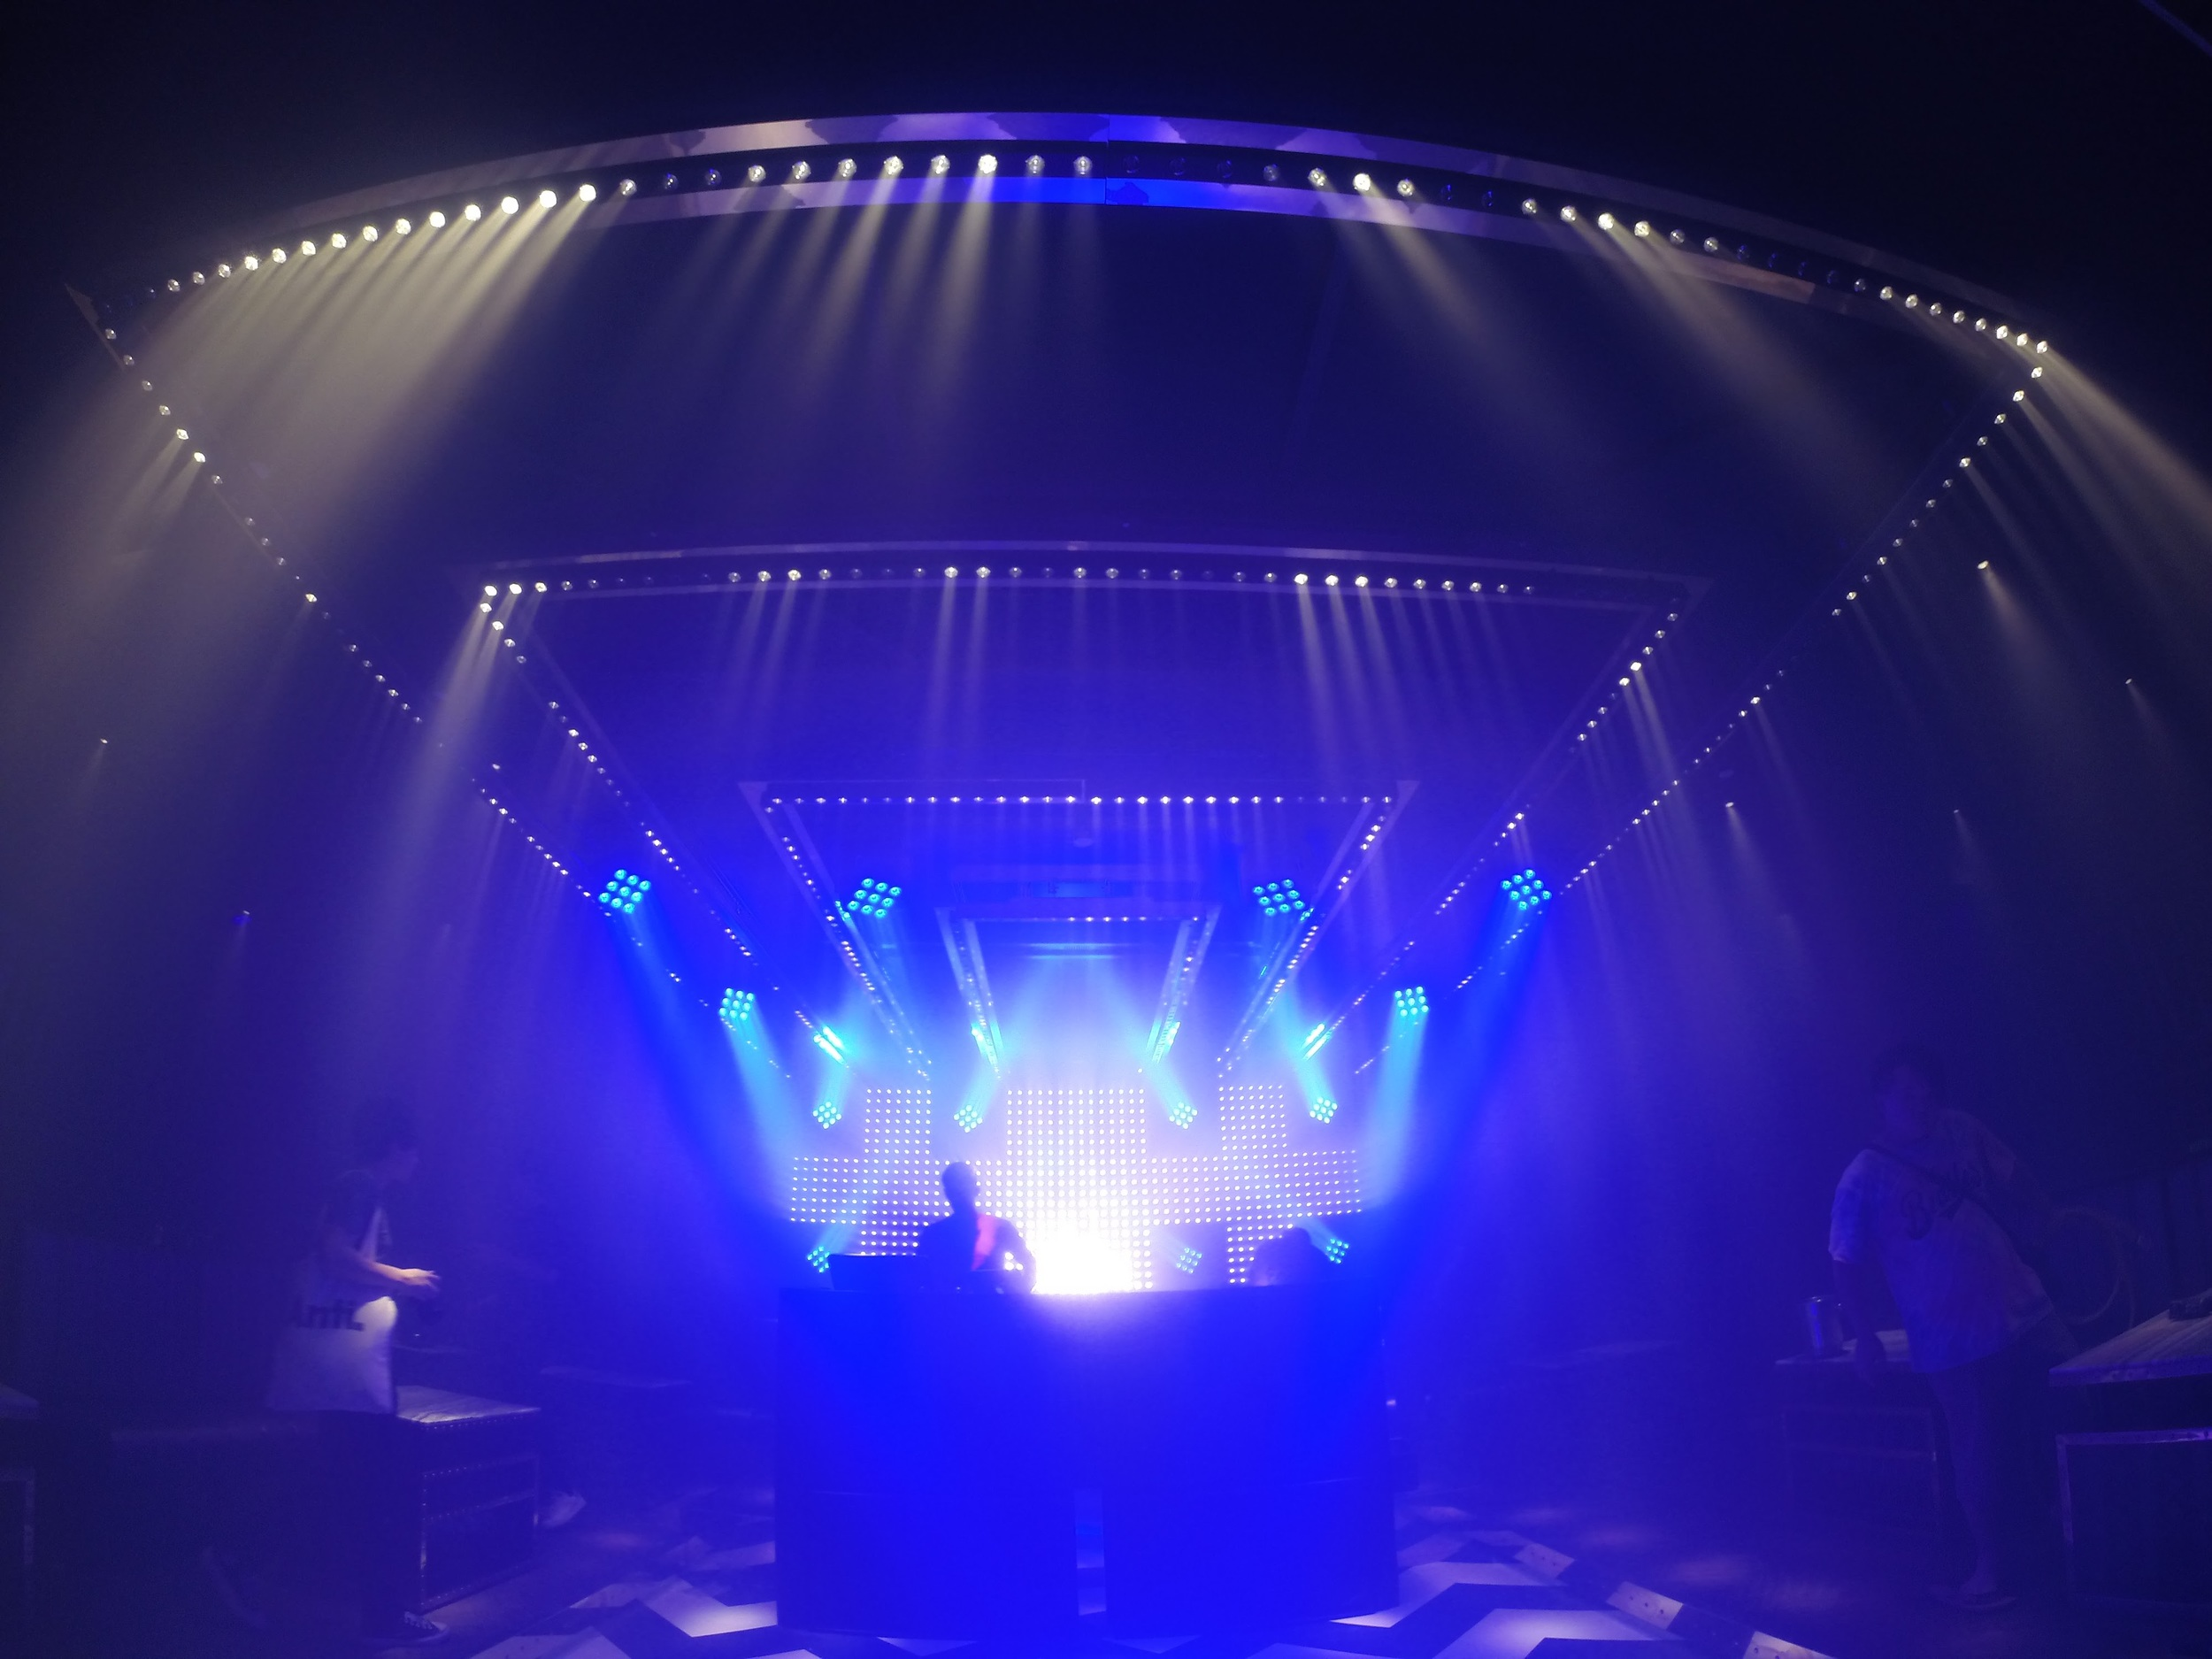 Club lighting design